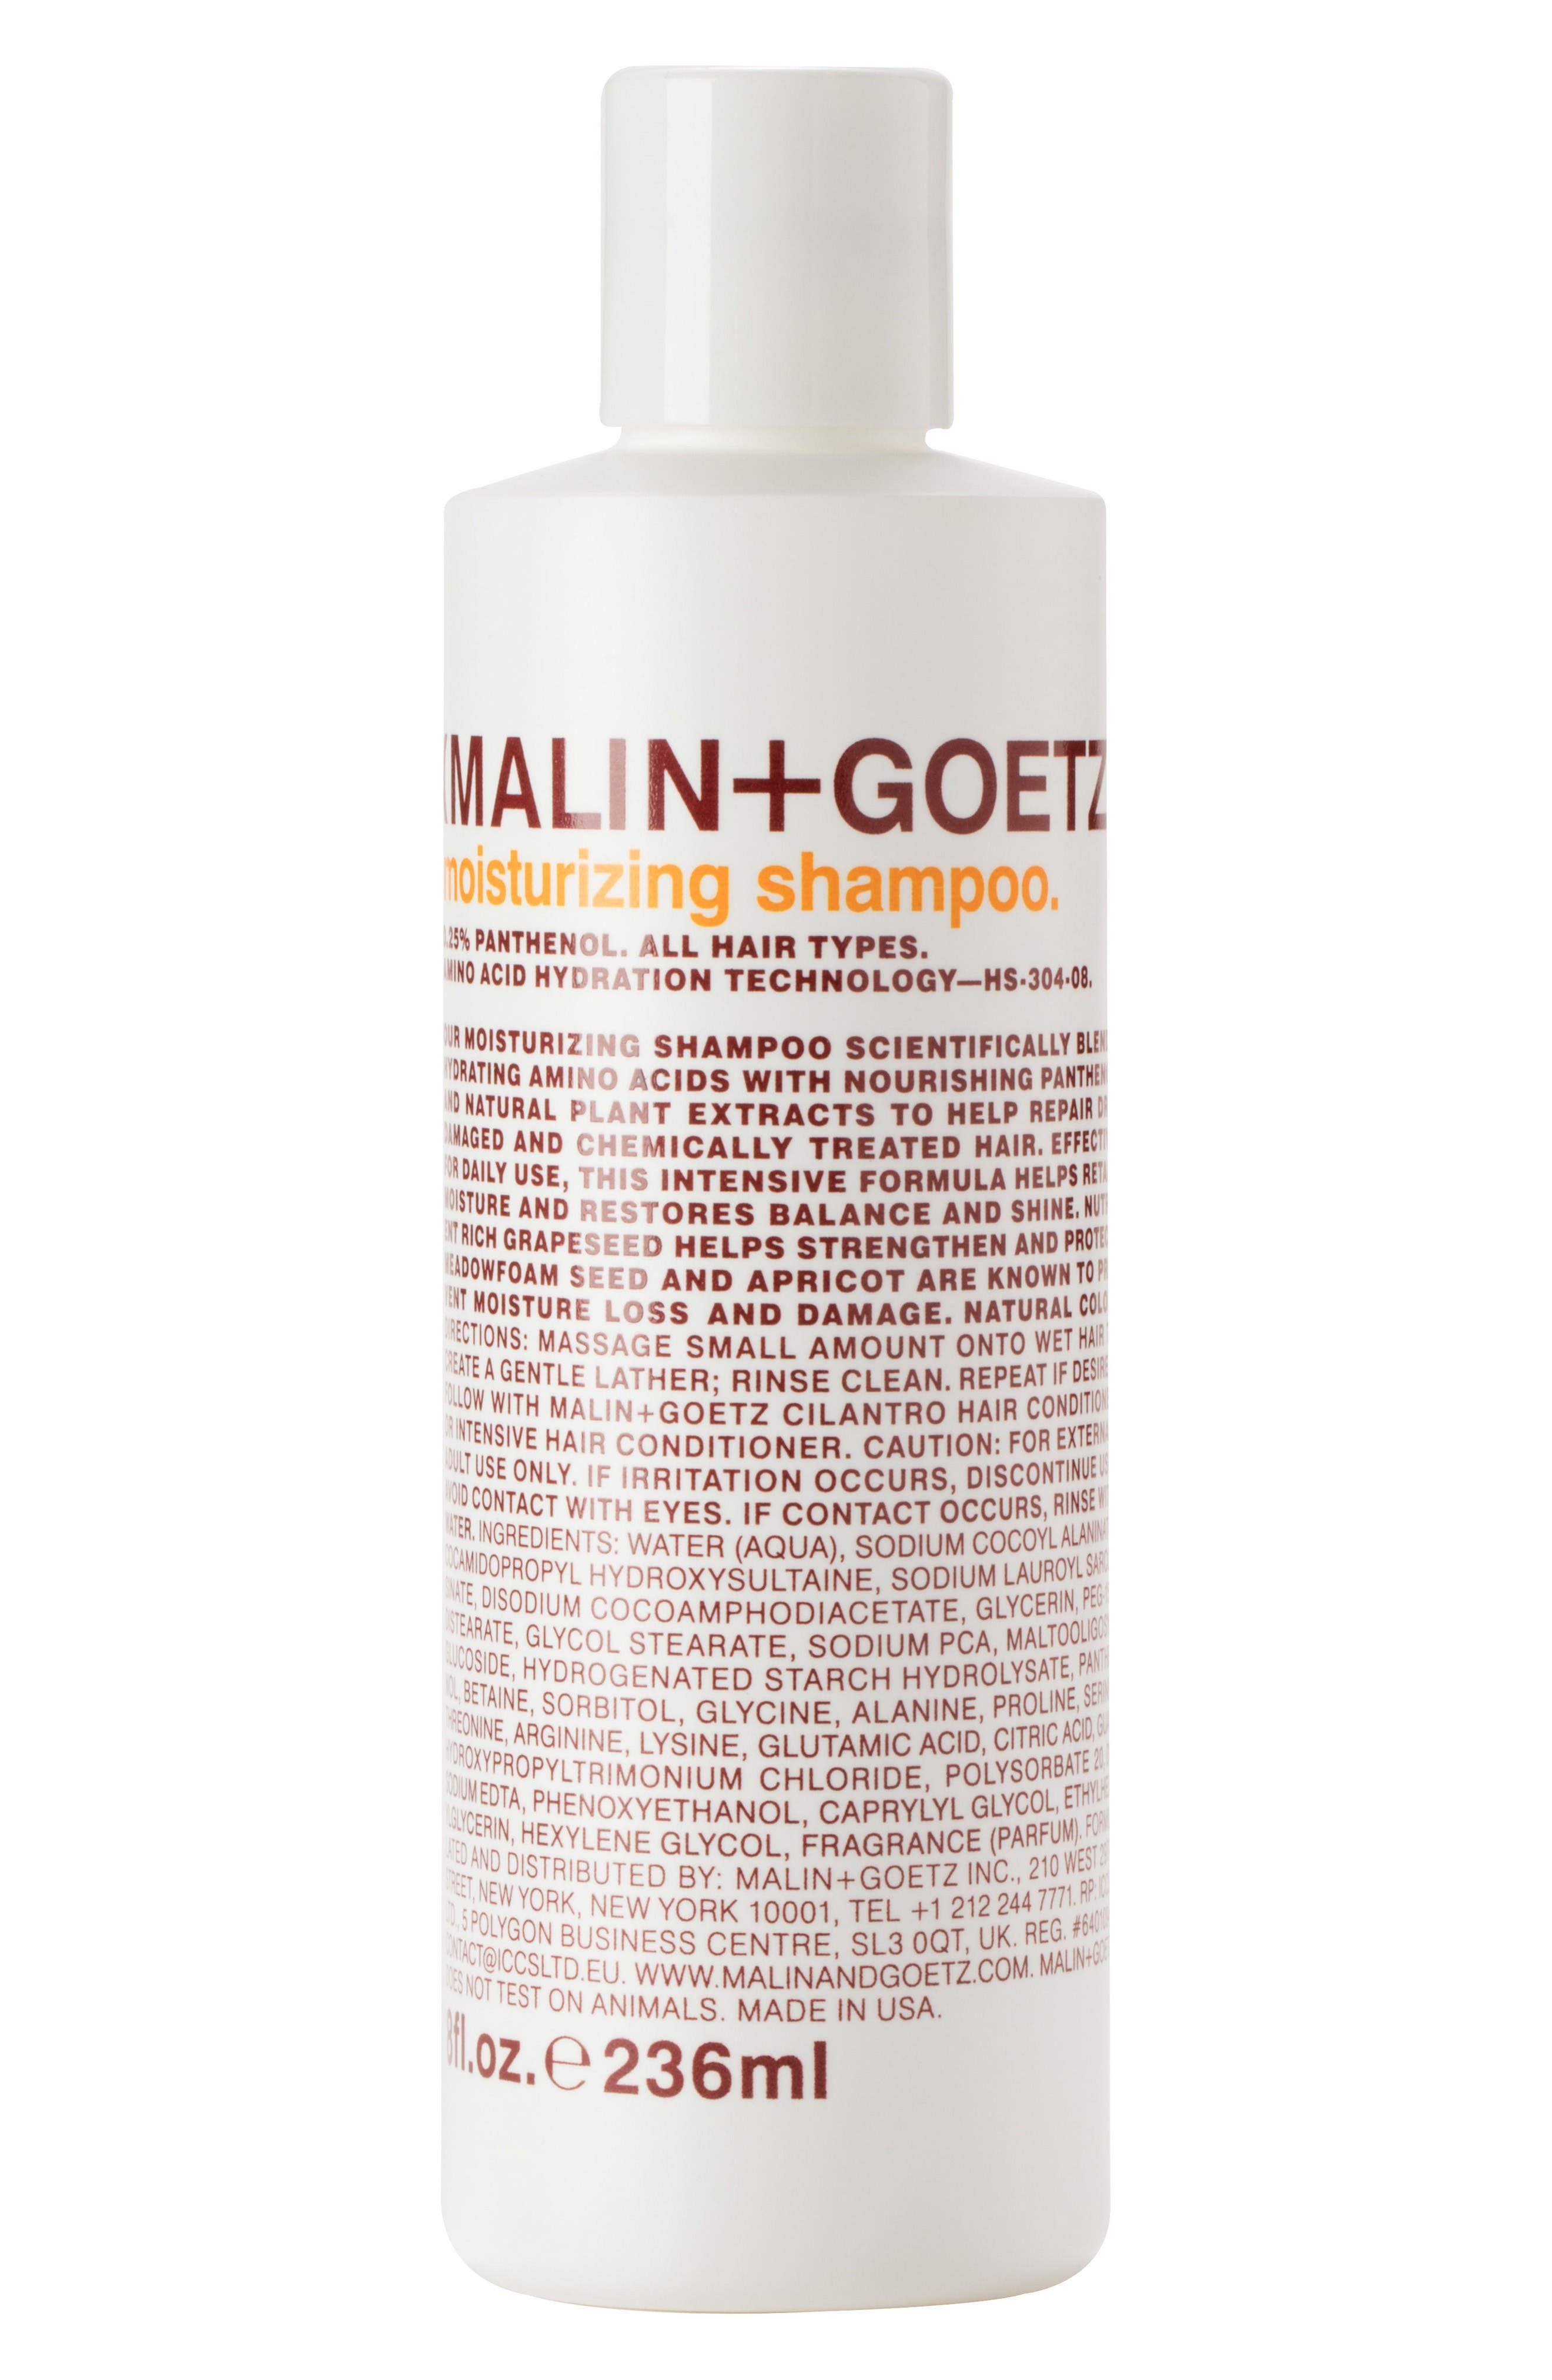 Alternate Image 1 Selected - MALIN+GOETZ Moisturizing Shampoo